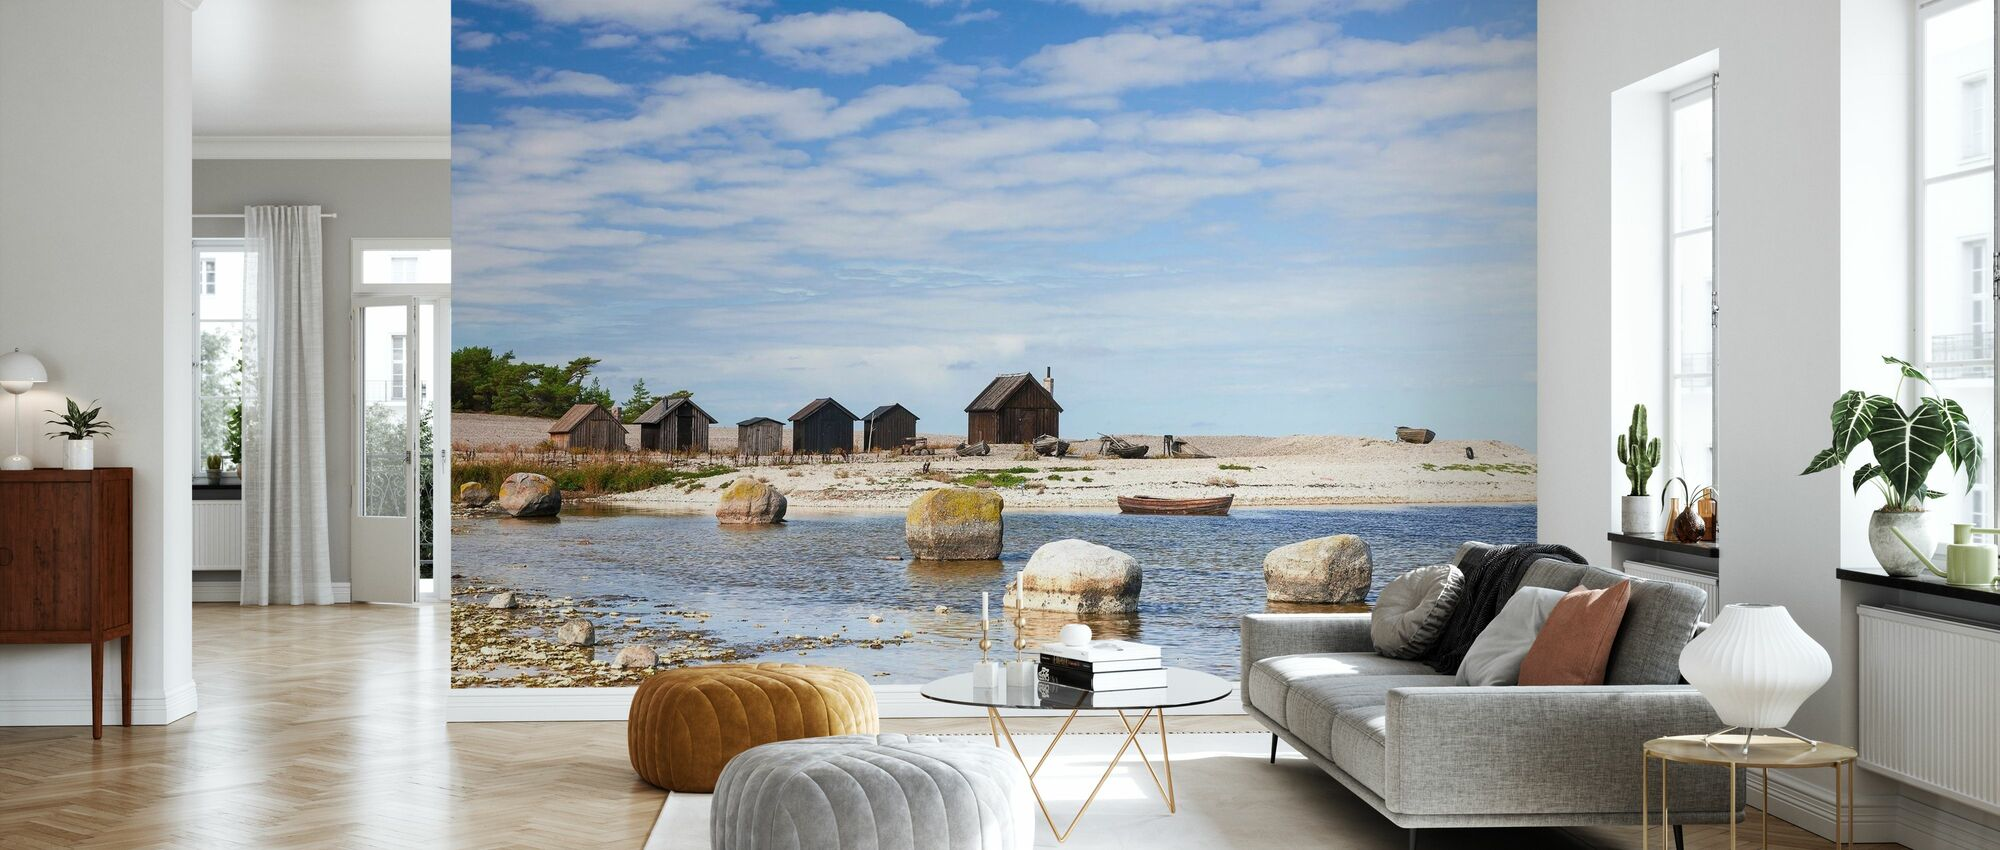 Old Fishing Huts - Wallpaper - Living Room